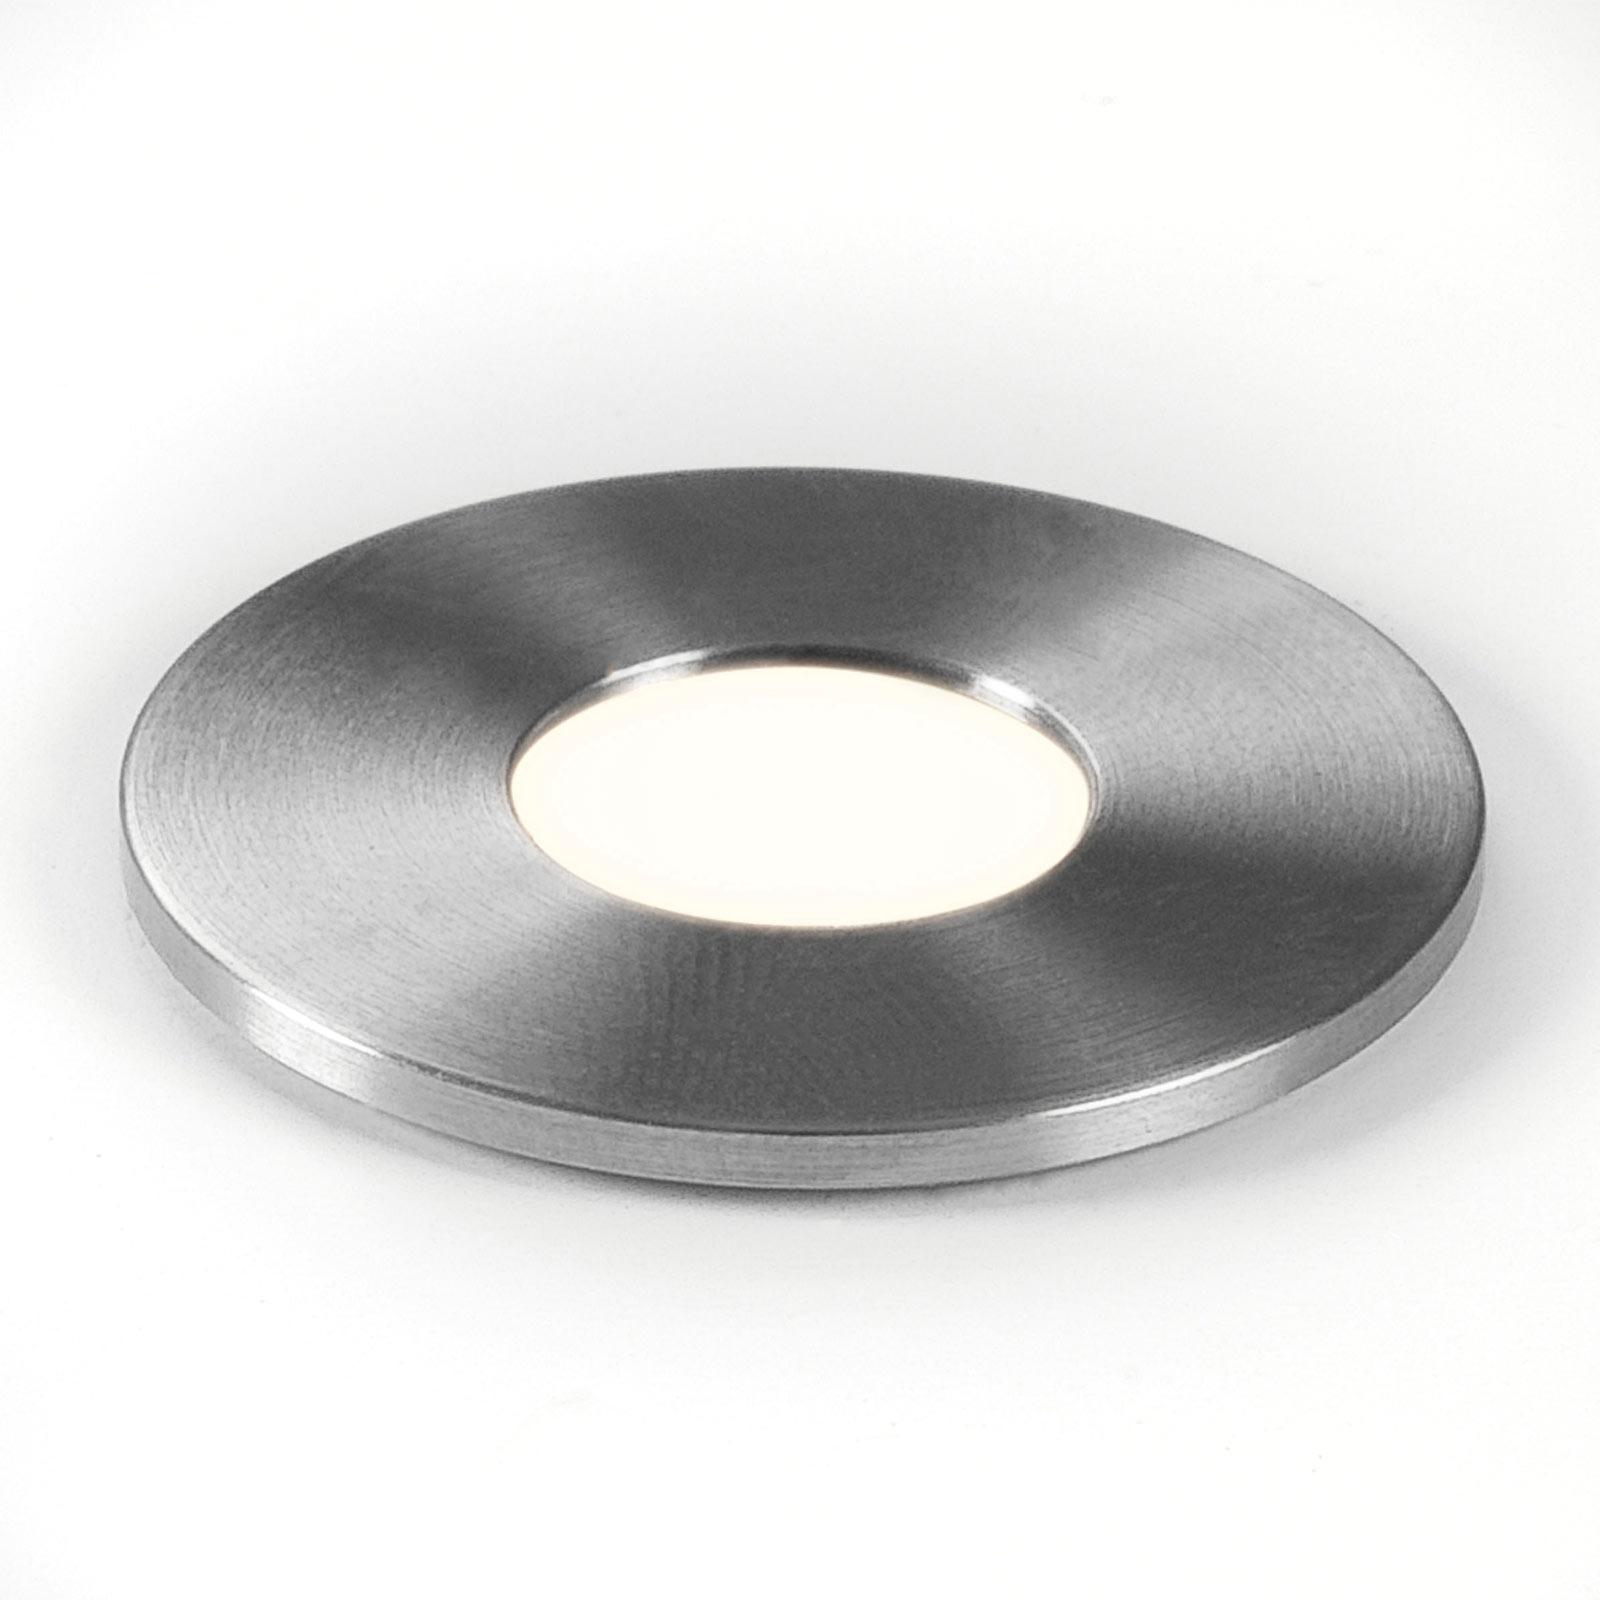 Astro Terra 28 Round LED inbouwlamp, IP65